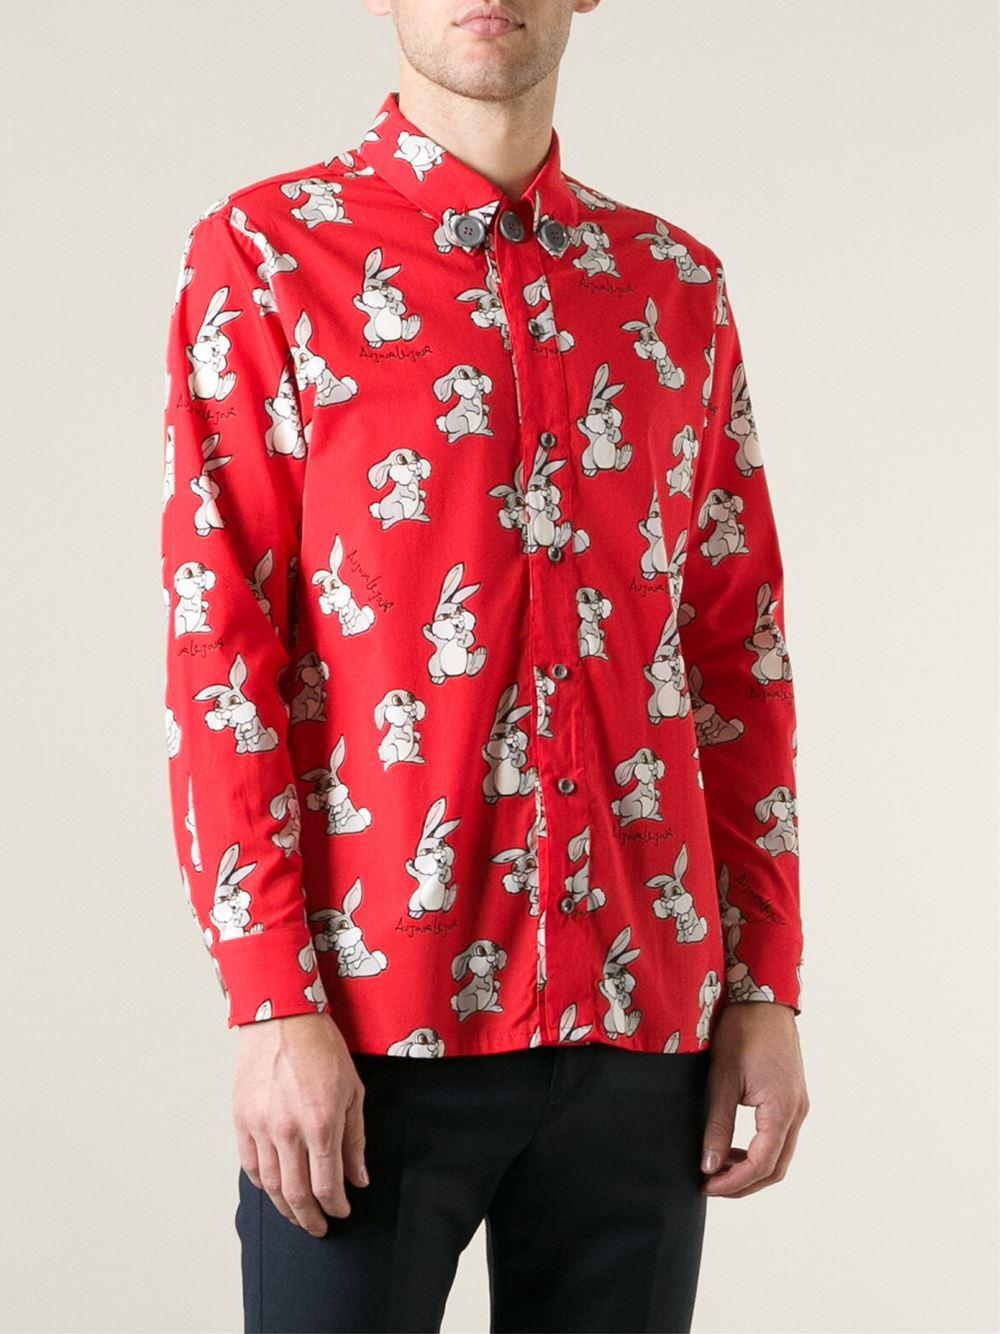 Farfetch Clothing Uk